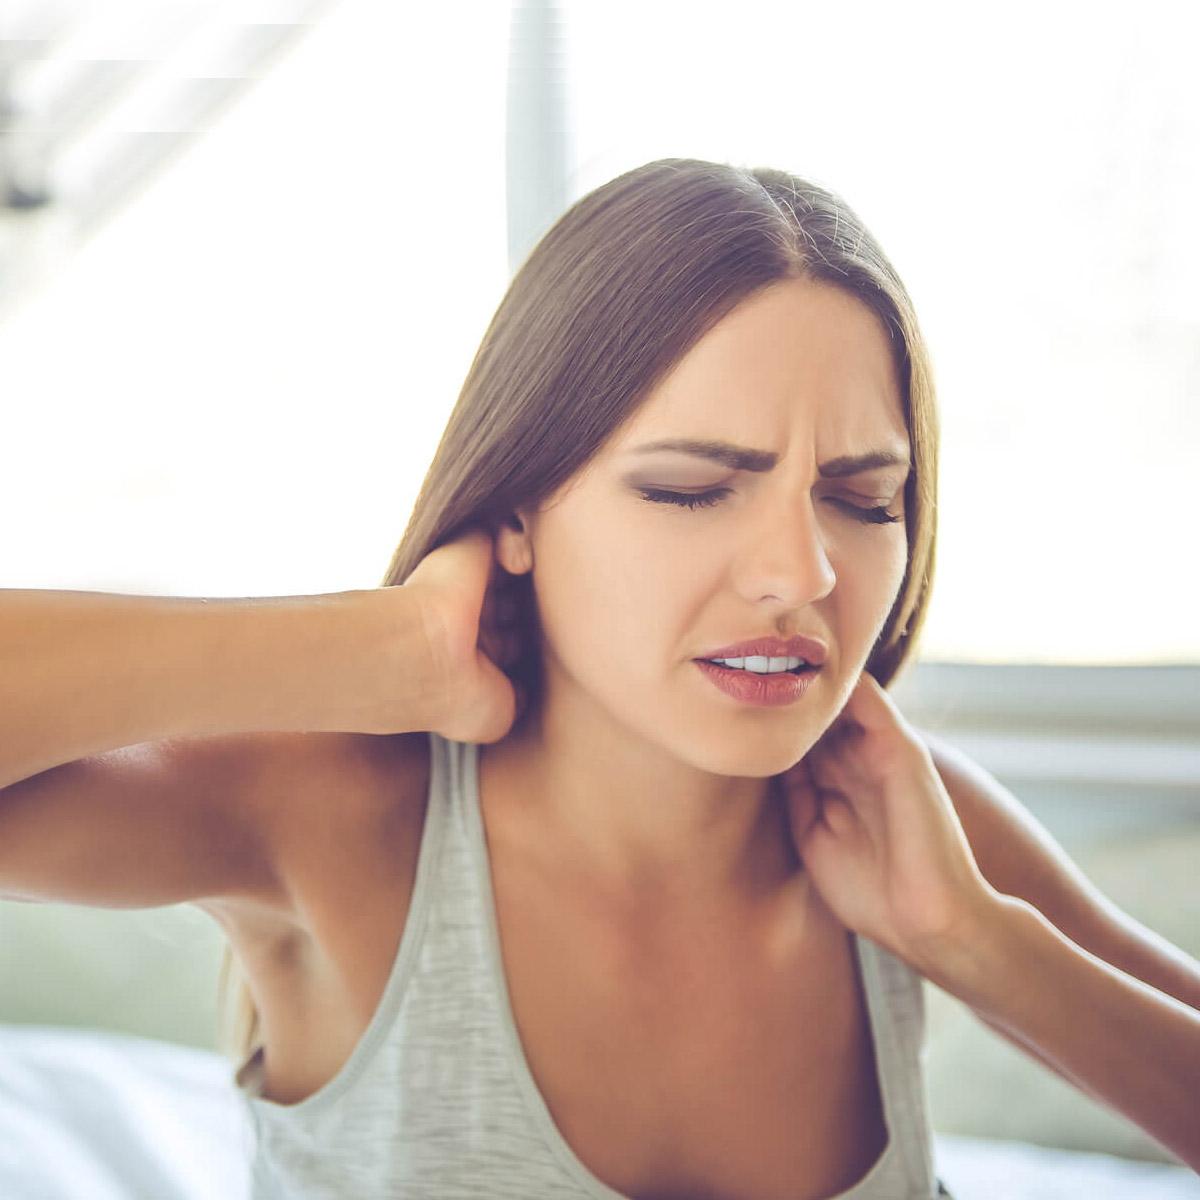 Sormede artriit ja selle ravi Strips liigeste raviks